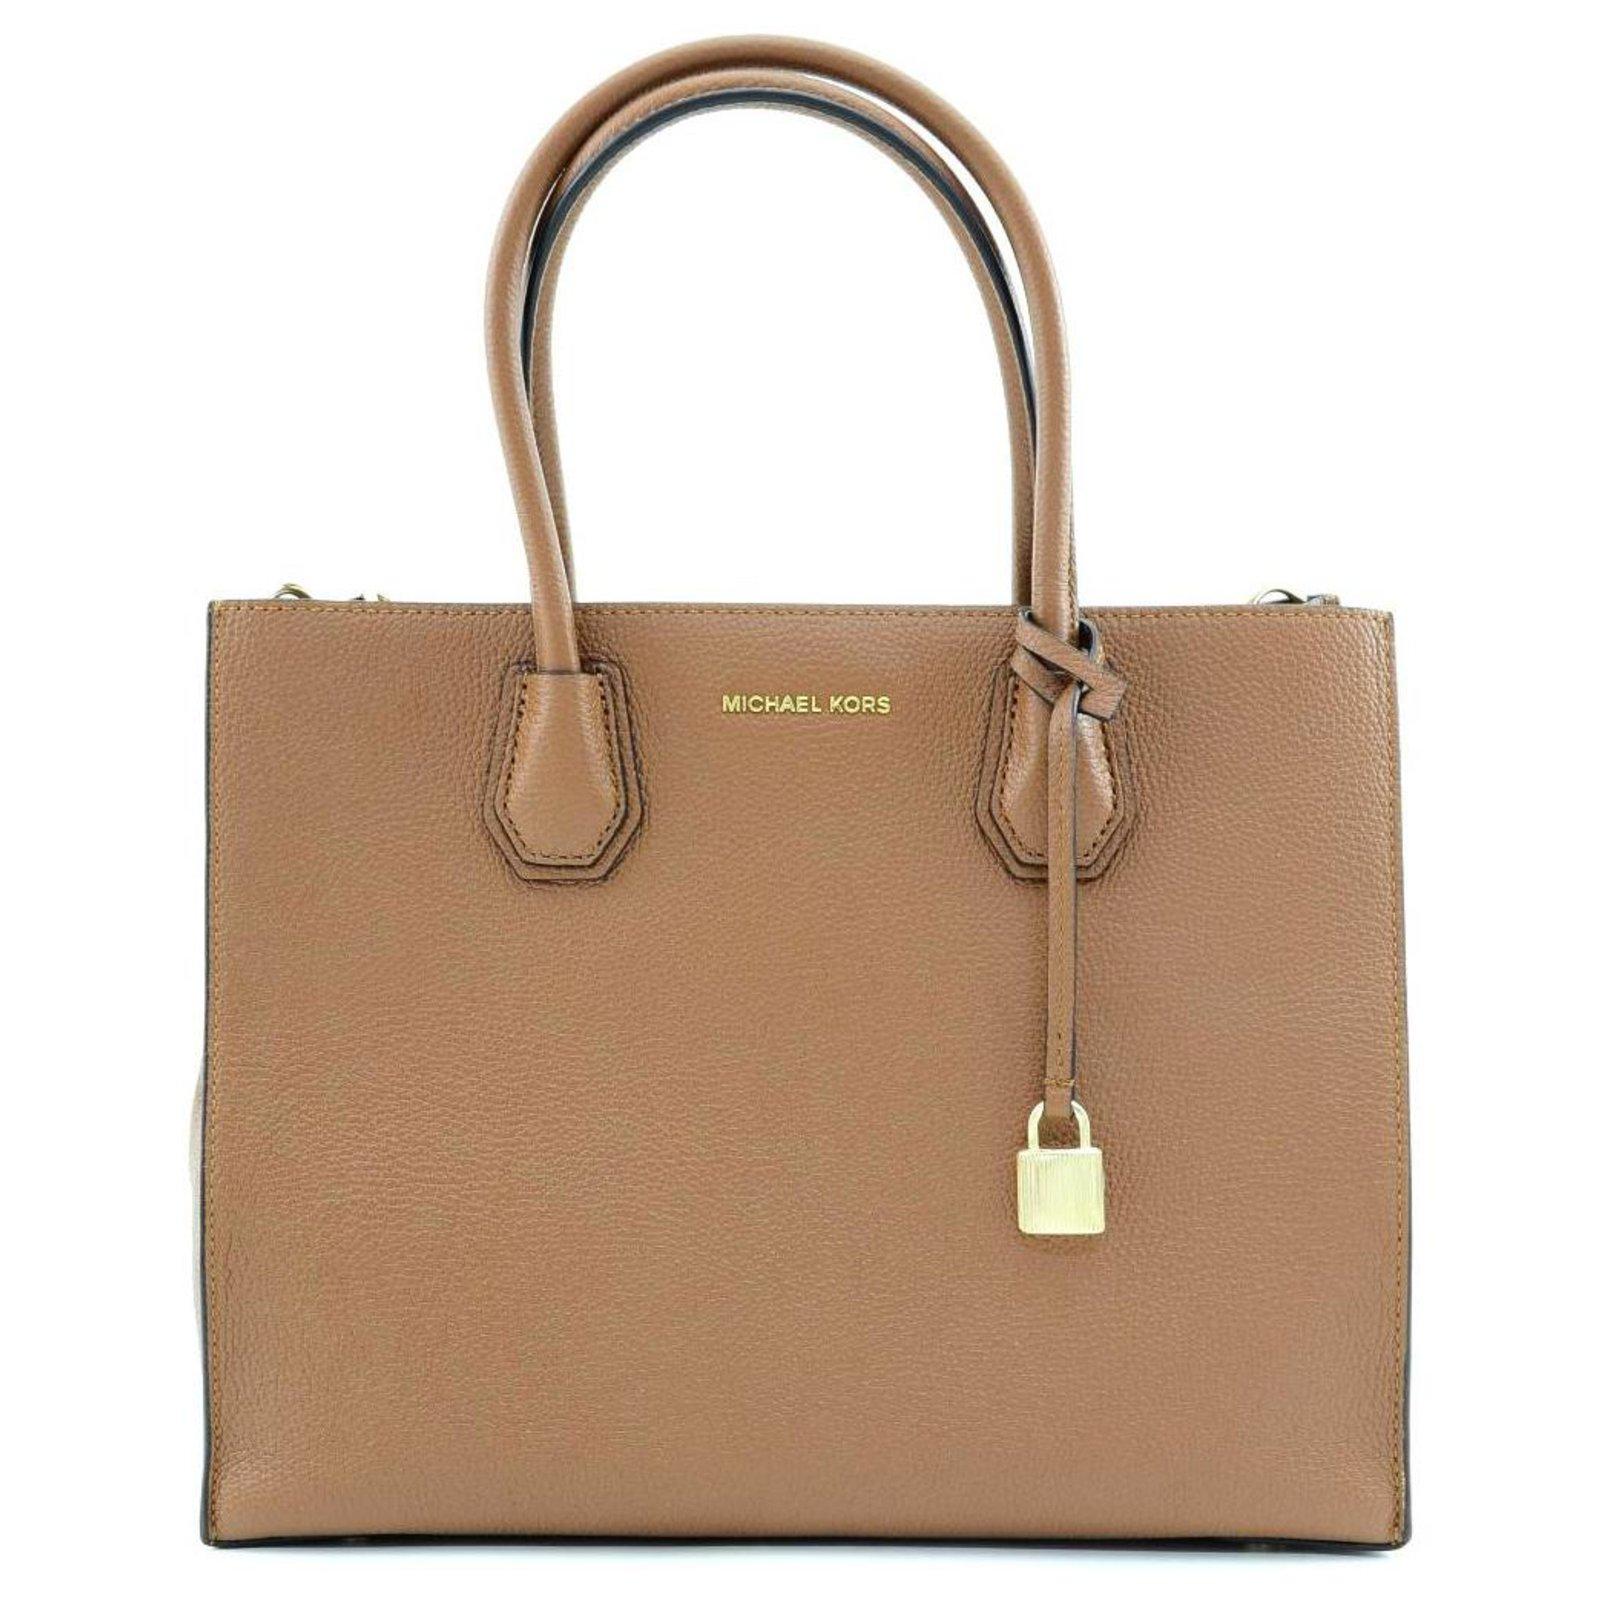 Michael Kors Mk Tote Bag Handbags Leather Brown Ref 118255